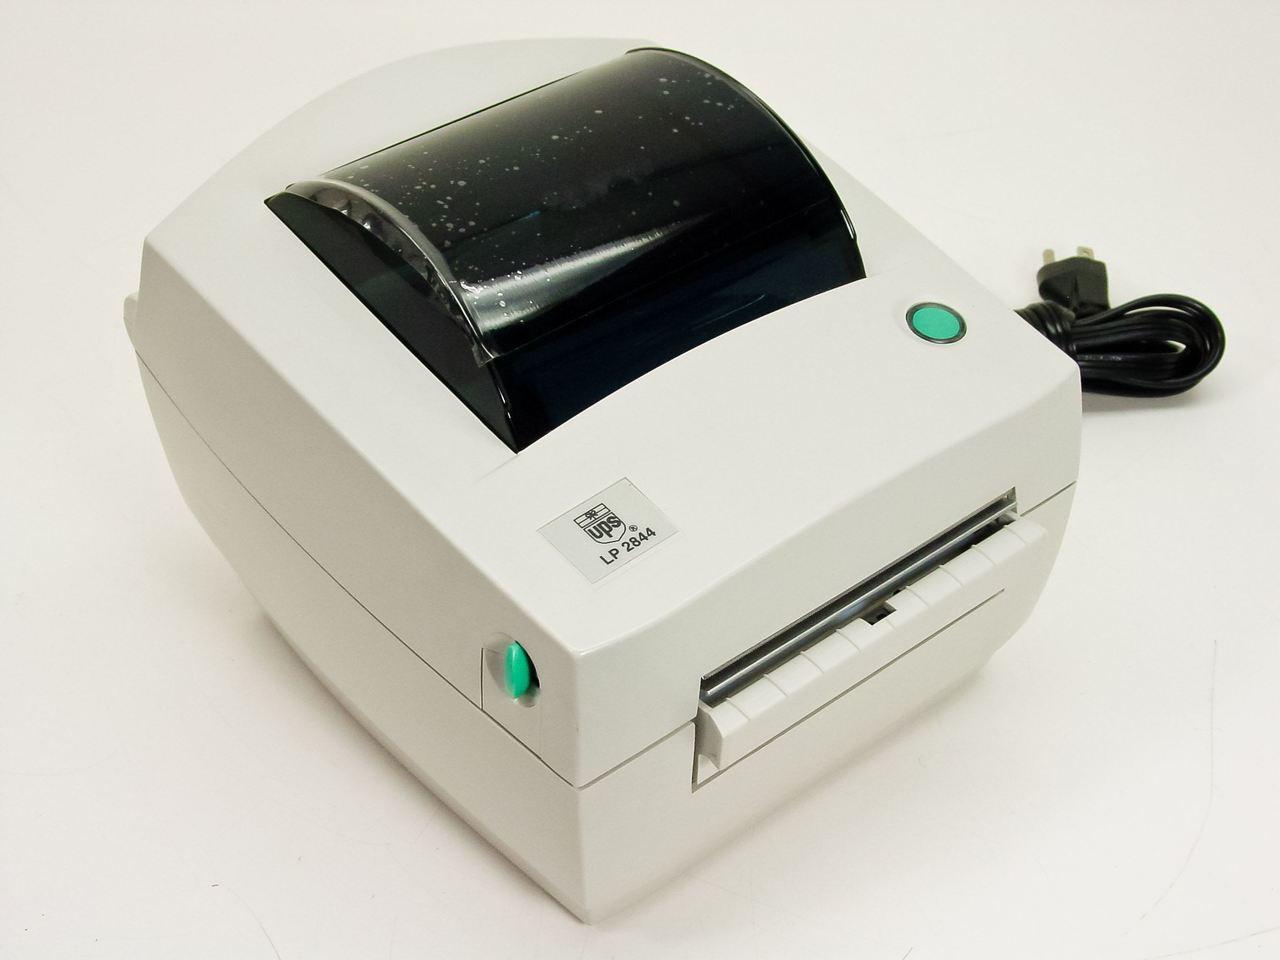 UPS LP 2844 Zebra Thermal Label Printer with USB